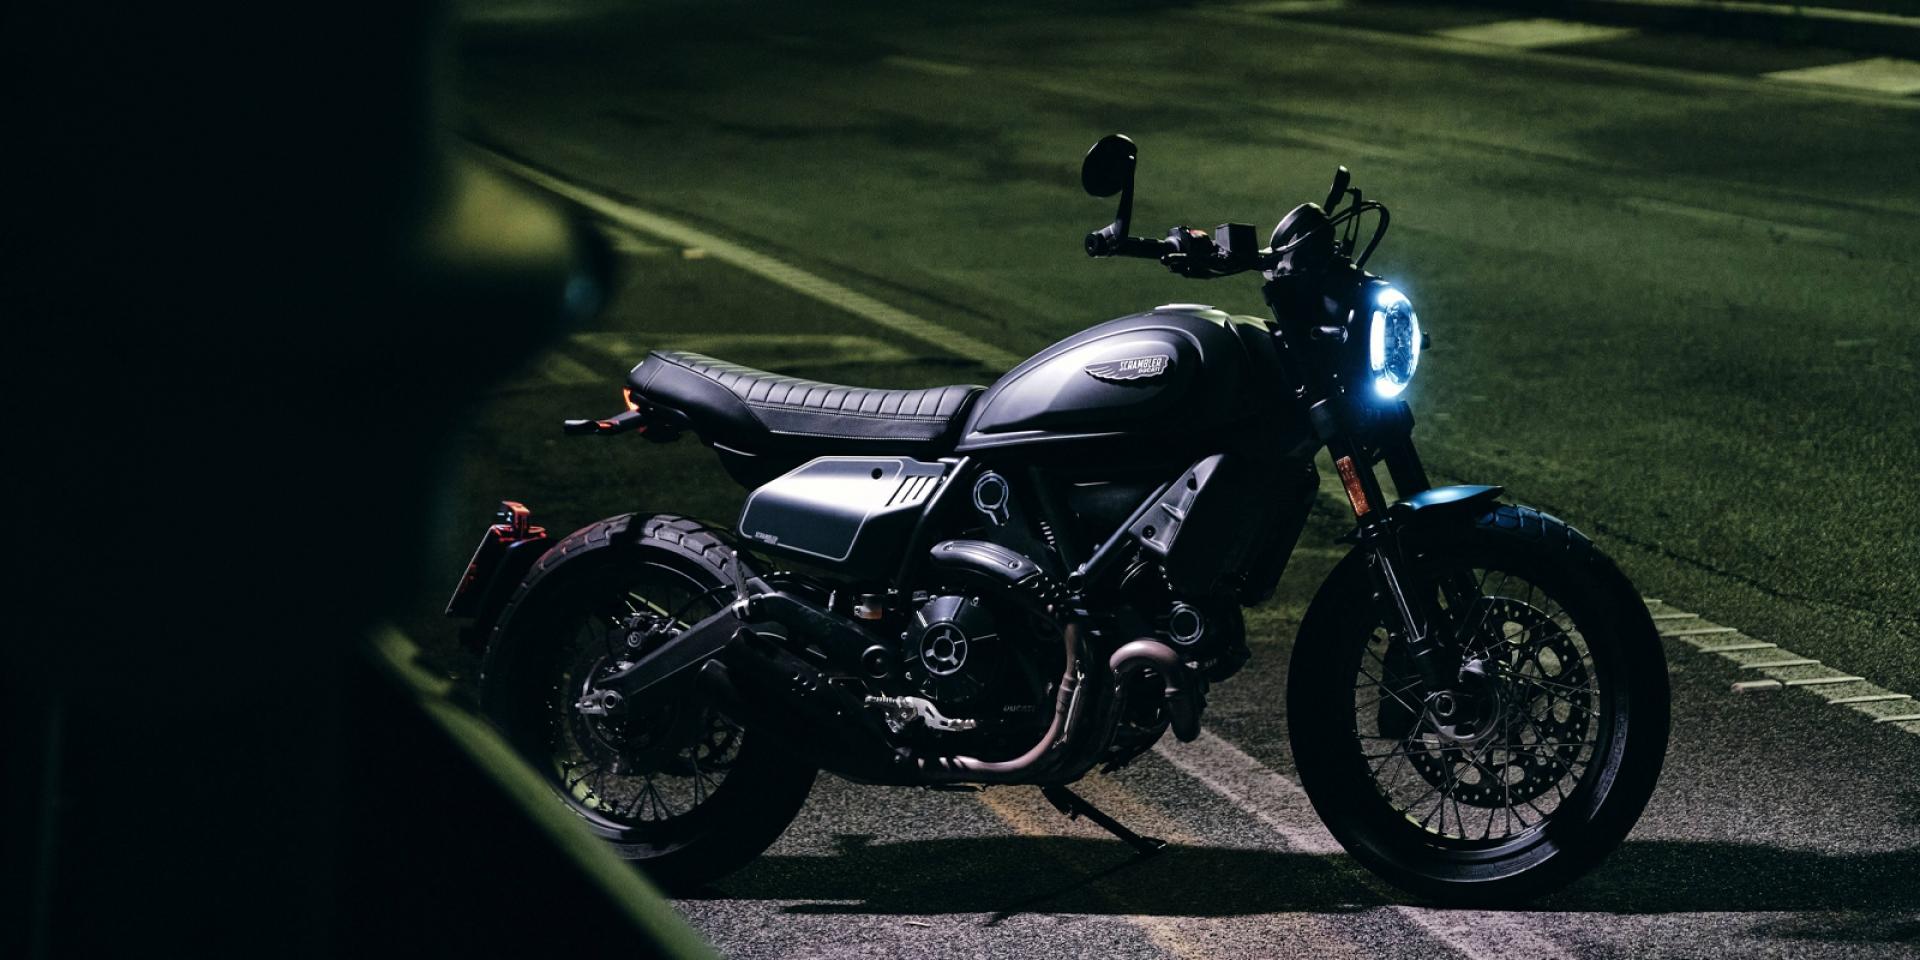 Flat Track風格低調黑!Ducati Scrambler Nightshift 新車發表